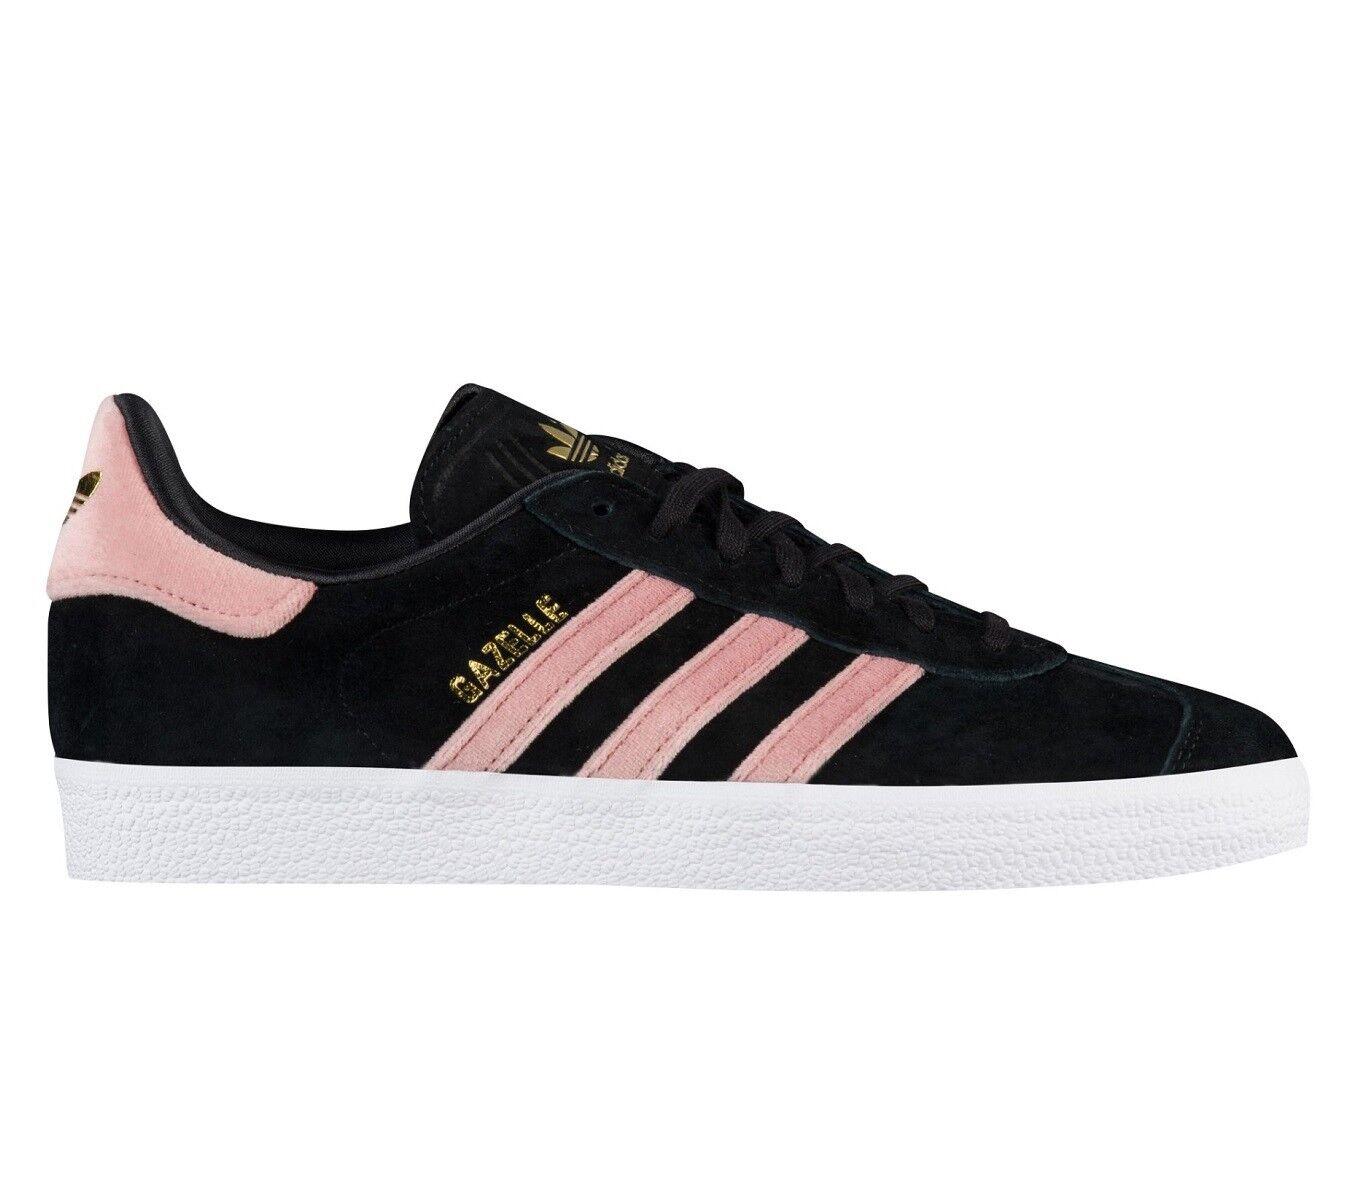 Adidas Gazelle Velvet Vibes Pack Womens DB0164 Black Raw Pink shoes Size 6